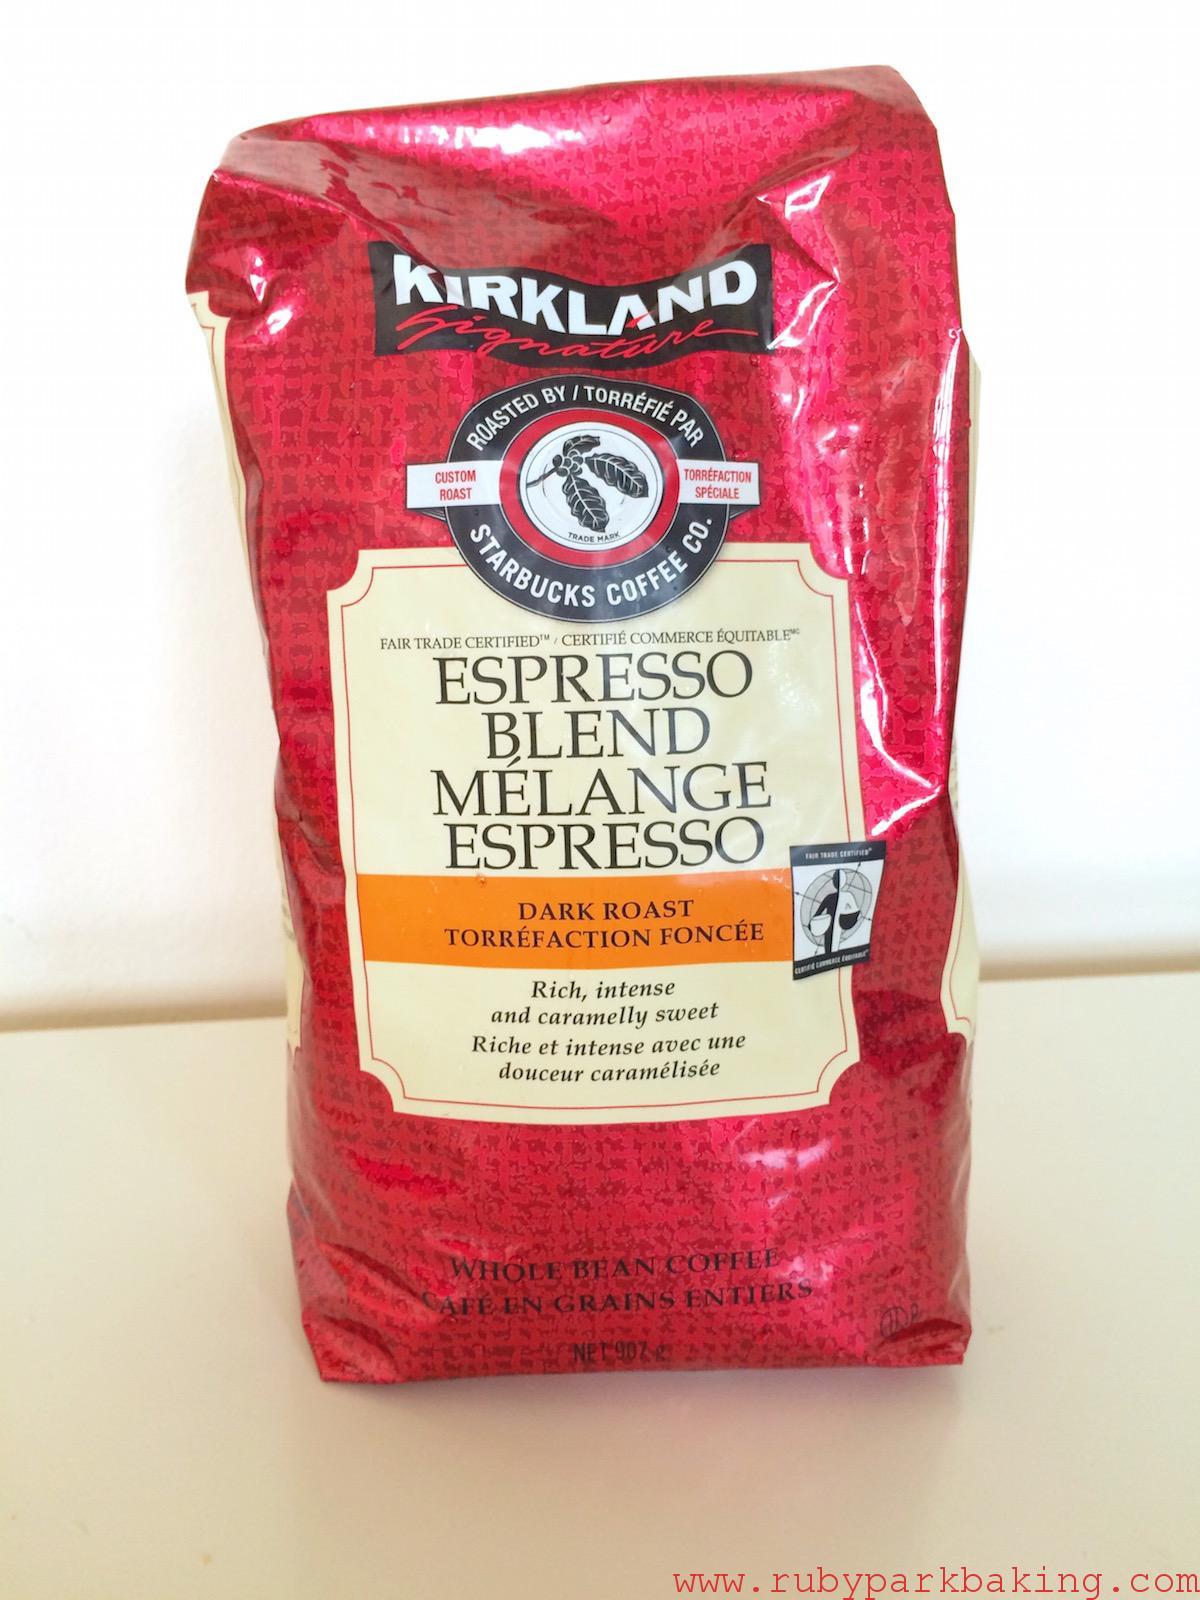 Costoco KIRKLAND Espresso Coffee Beans